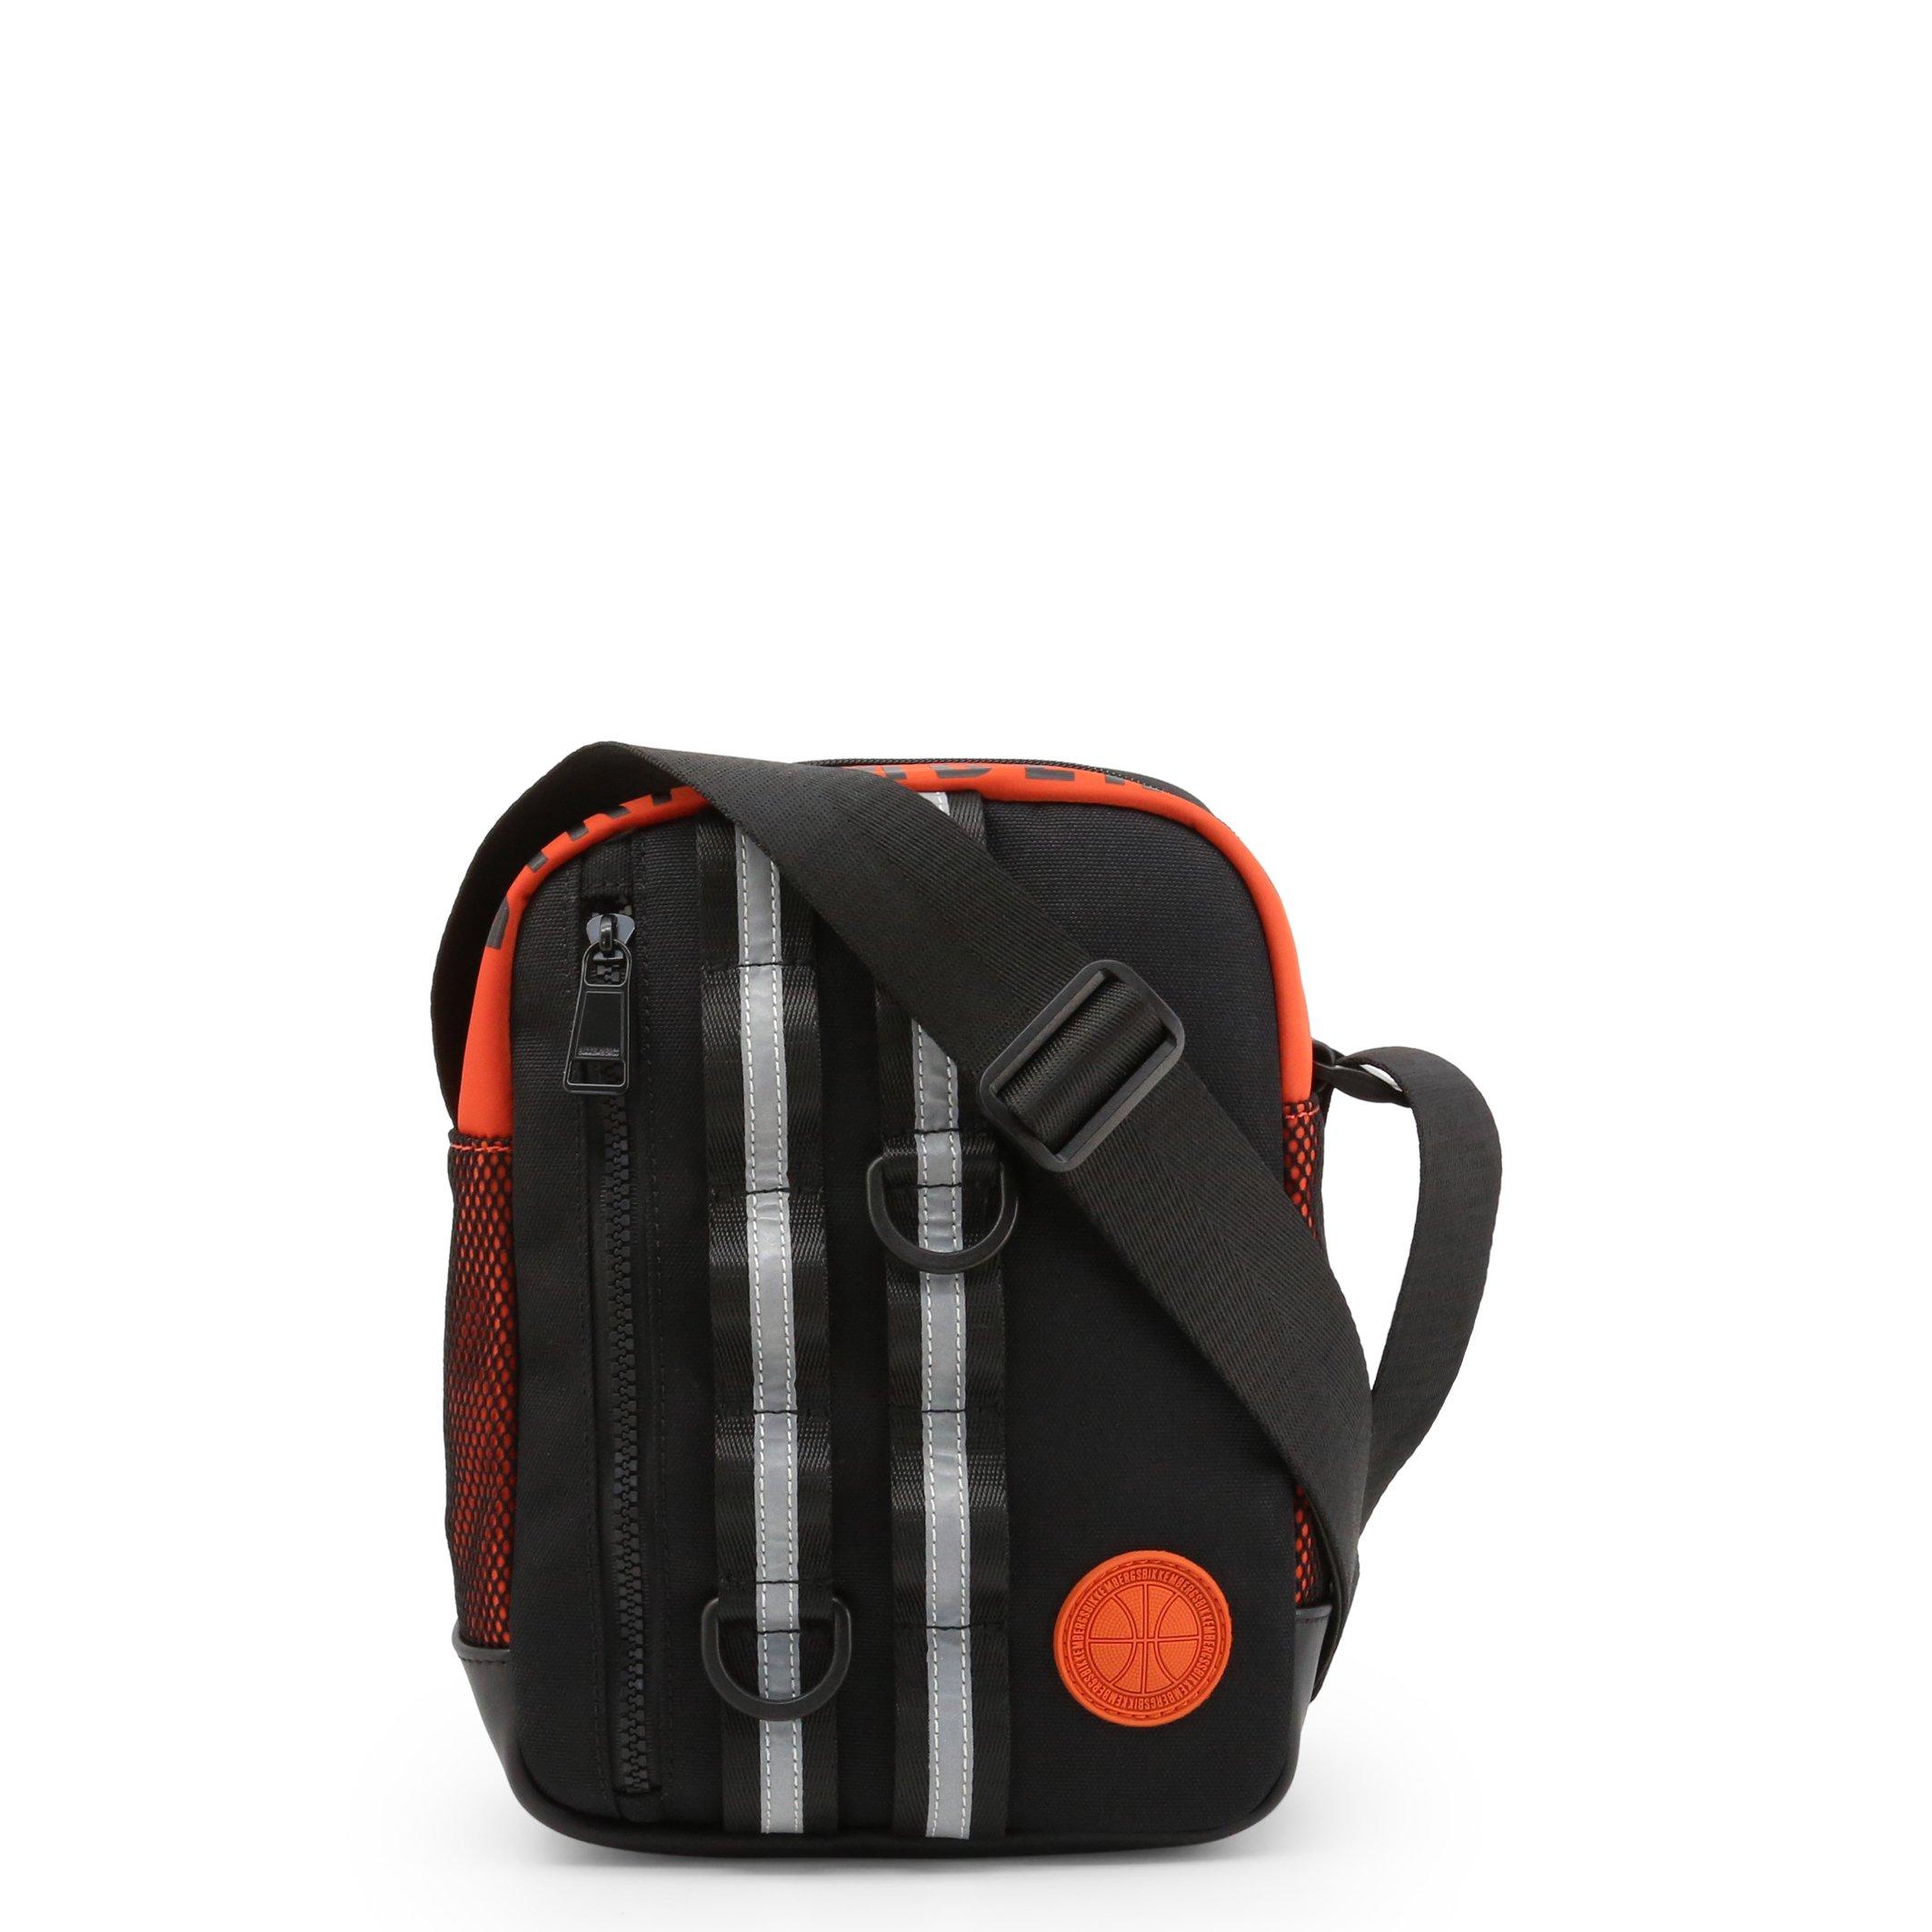 Bikkembergs Men's Crossbody Bag Various Colours E4APME1A0012 - black NOSIZE